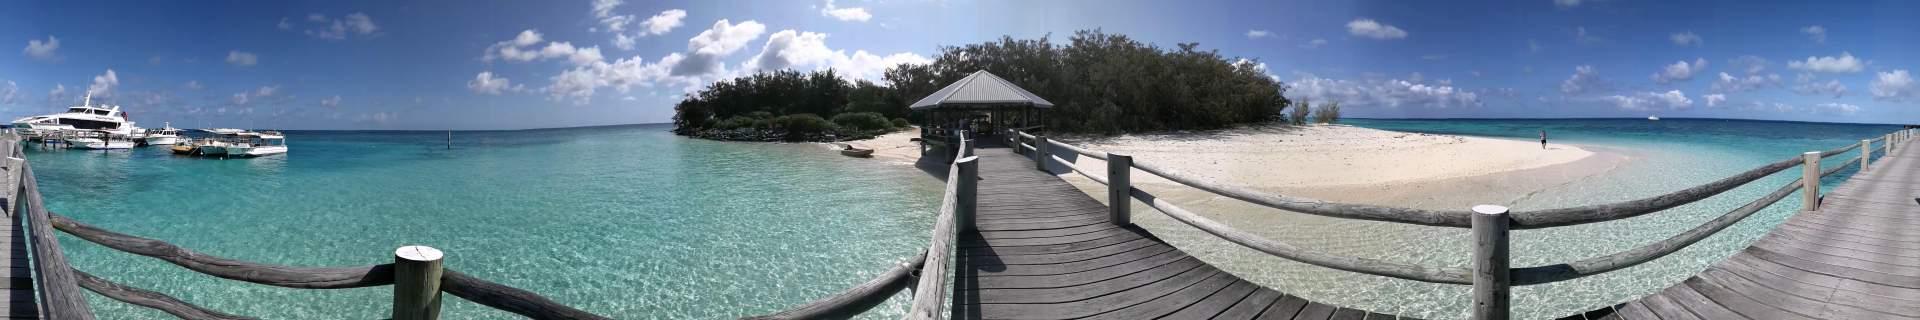 Juwi Pv Hybrid Project On The Great Barrier Reef Juwi